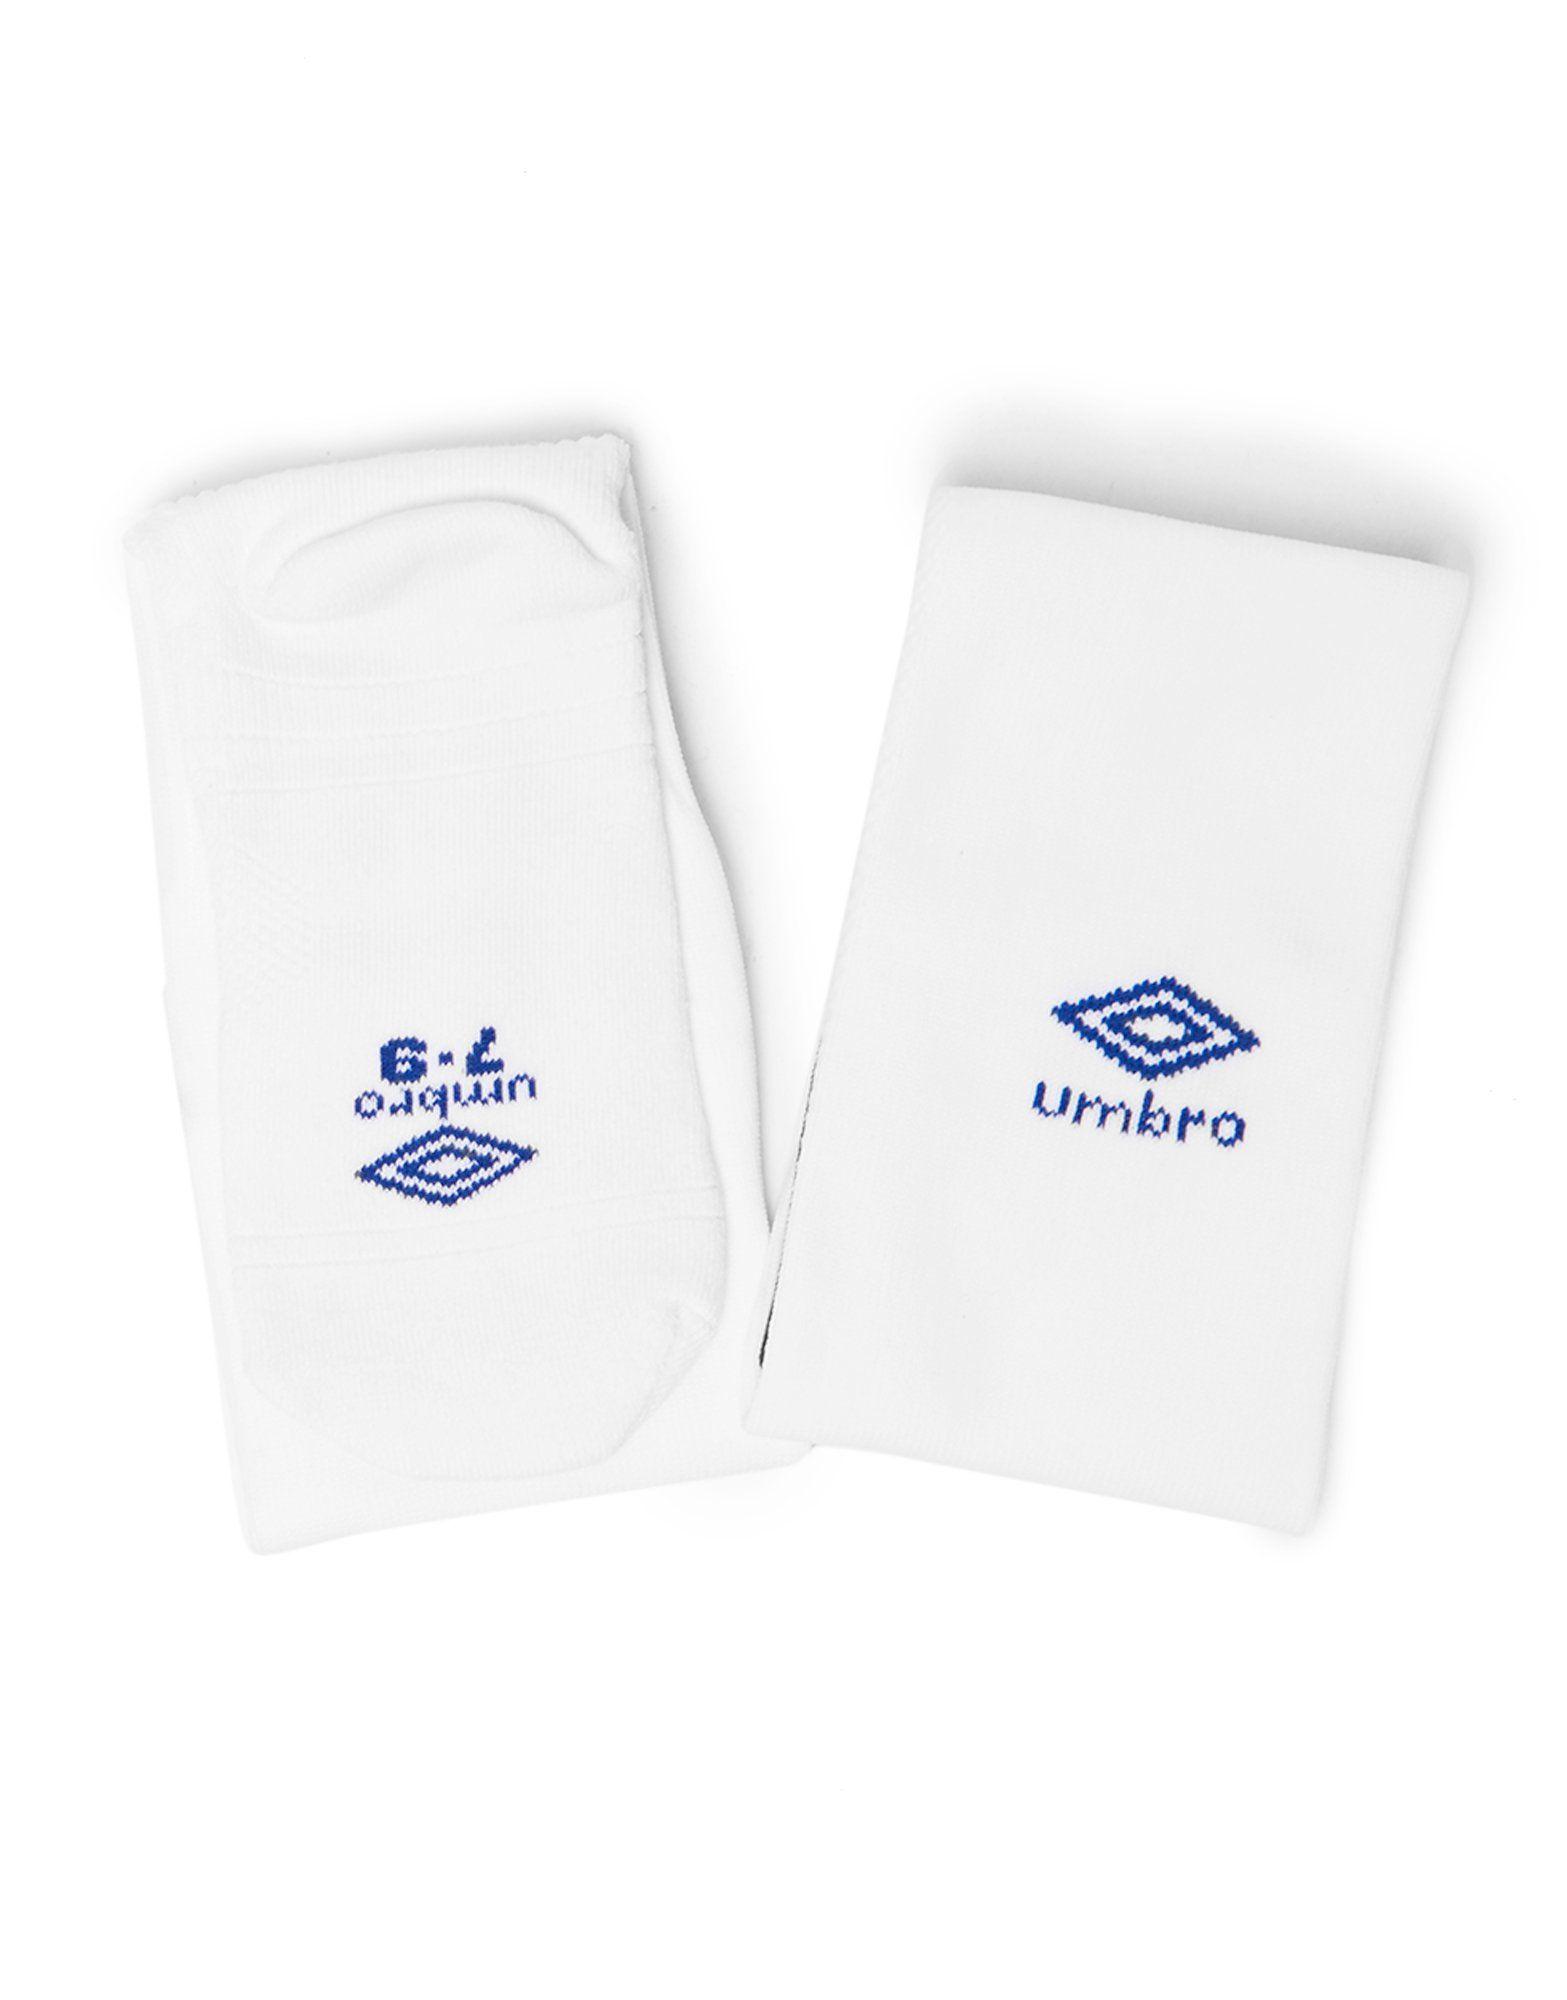 Umbro Everton FC 2017/18 Home Socks